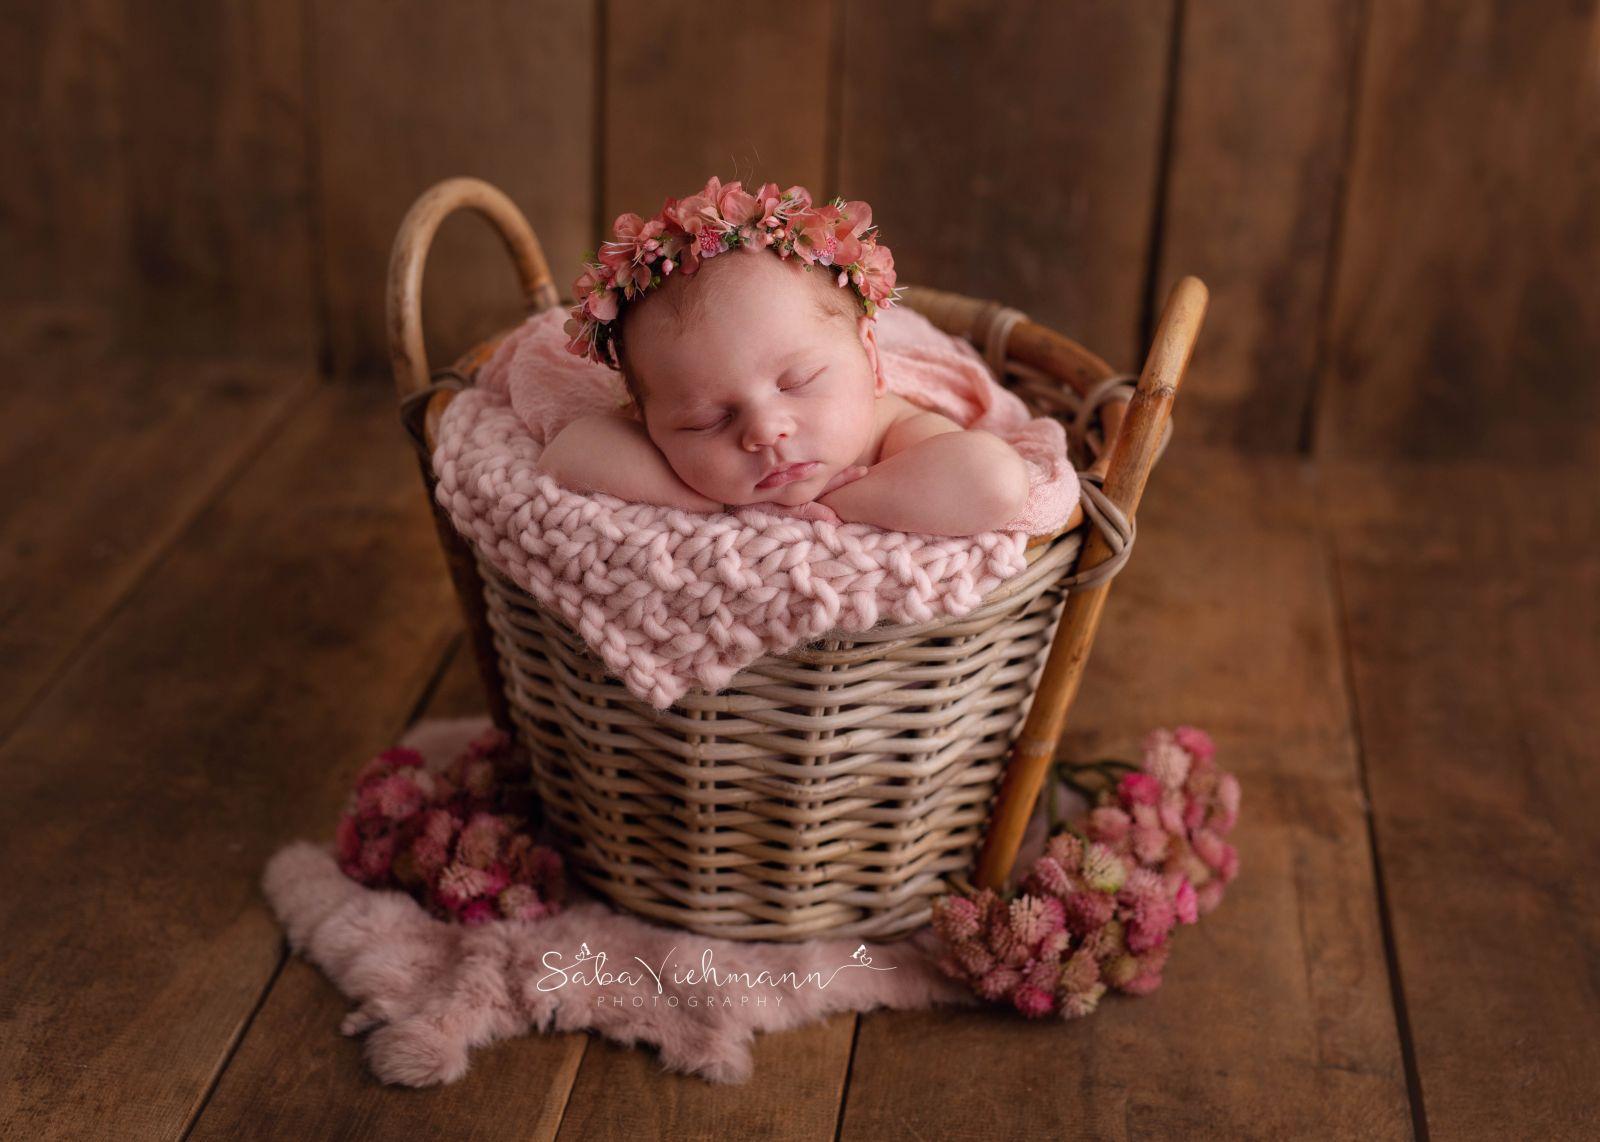 saba viehmann fotografie | fotostudio gießen | babyfotografie | babyfotograf | babyfotostudio | babyfotos | neugeborenenfotos | schwangerschaftsfotos | fotograf